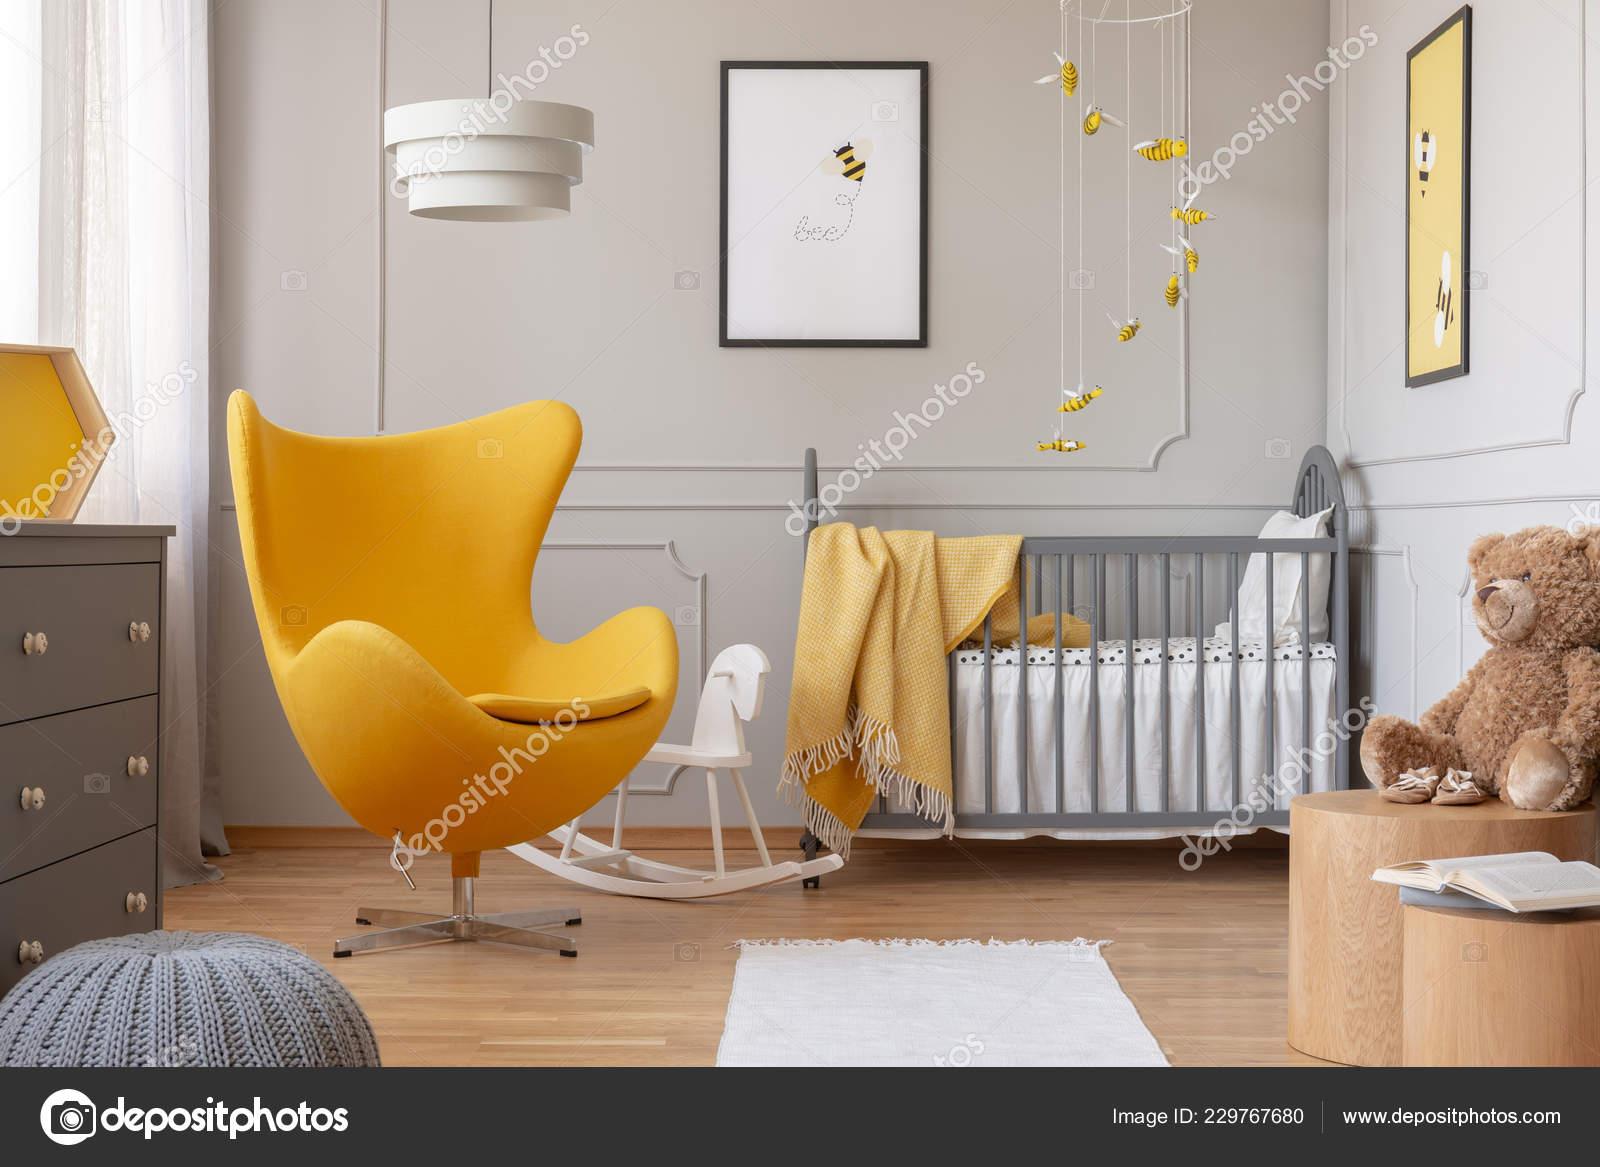 7648531538b Καρέκλα Και Λευκό Άλογο Λικνίσματος Κίτρινο Αυγό Εξελιγμένα Βρεφικό Δωμάτιο–  εικόνα αρχείου